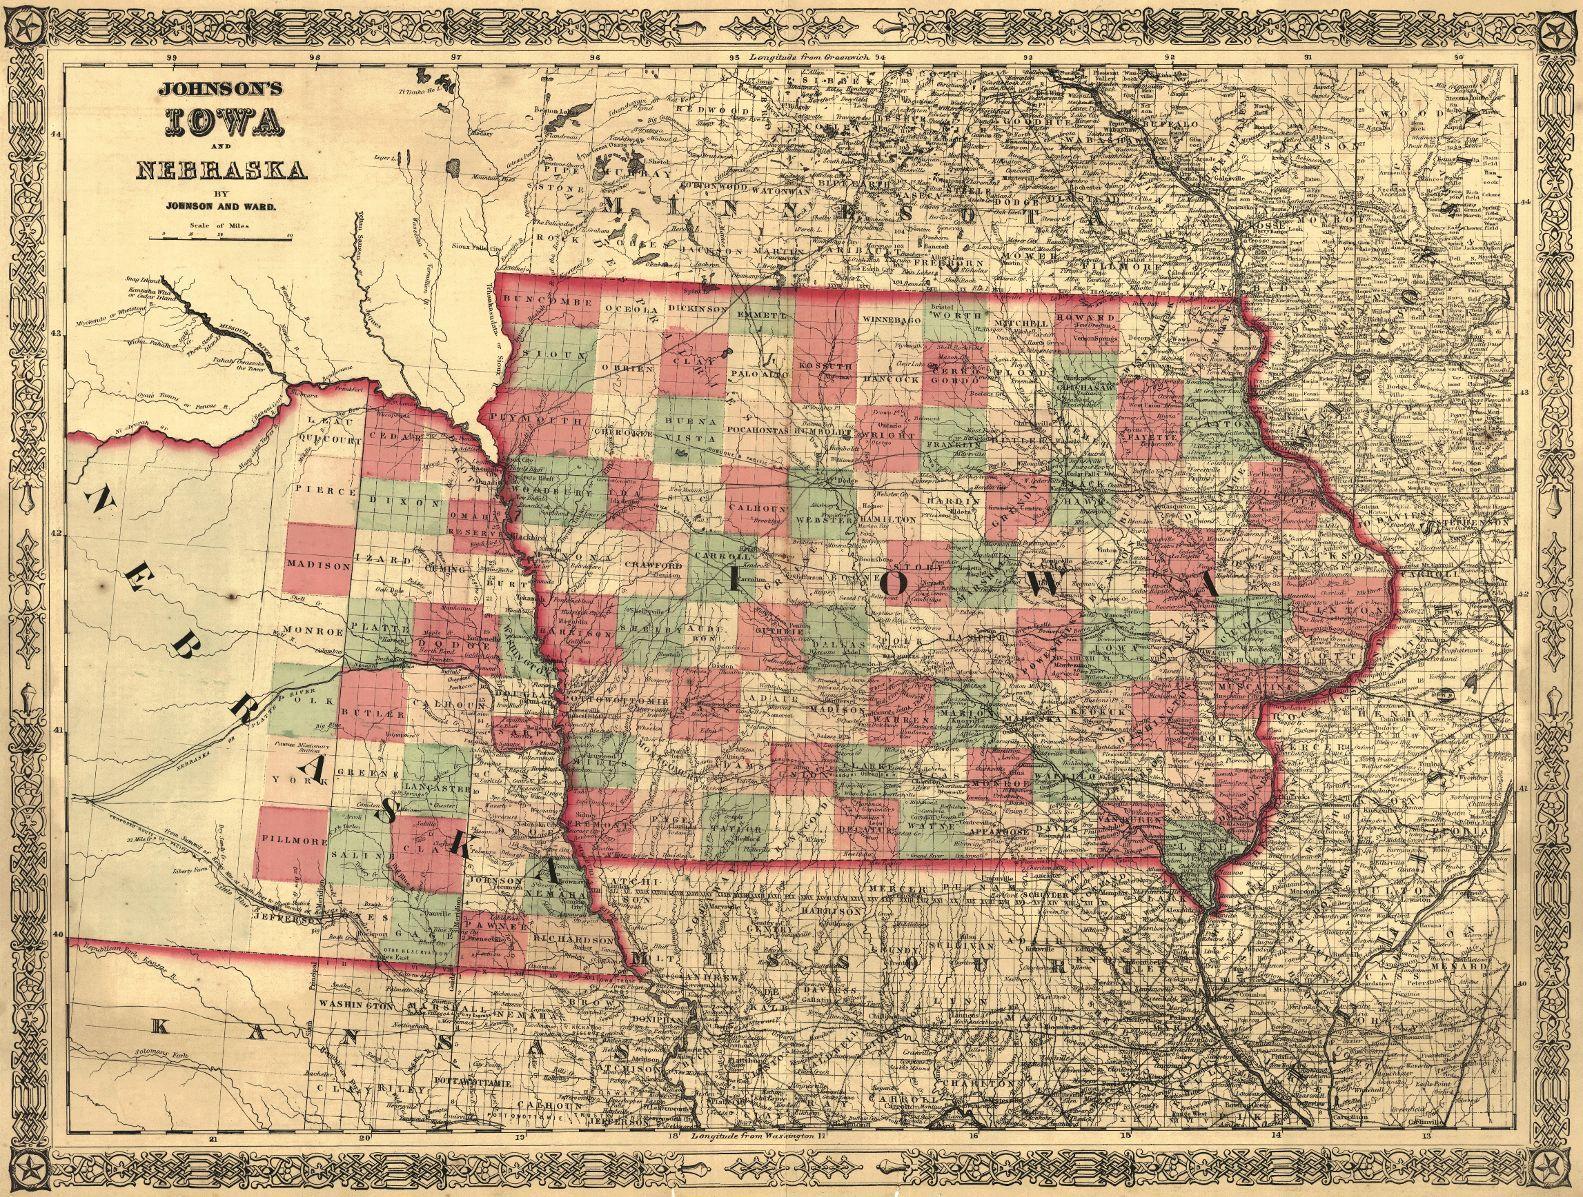 map antique. johnson's iowa and nebraska. johnson and ward